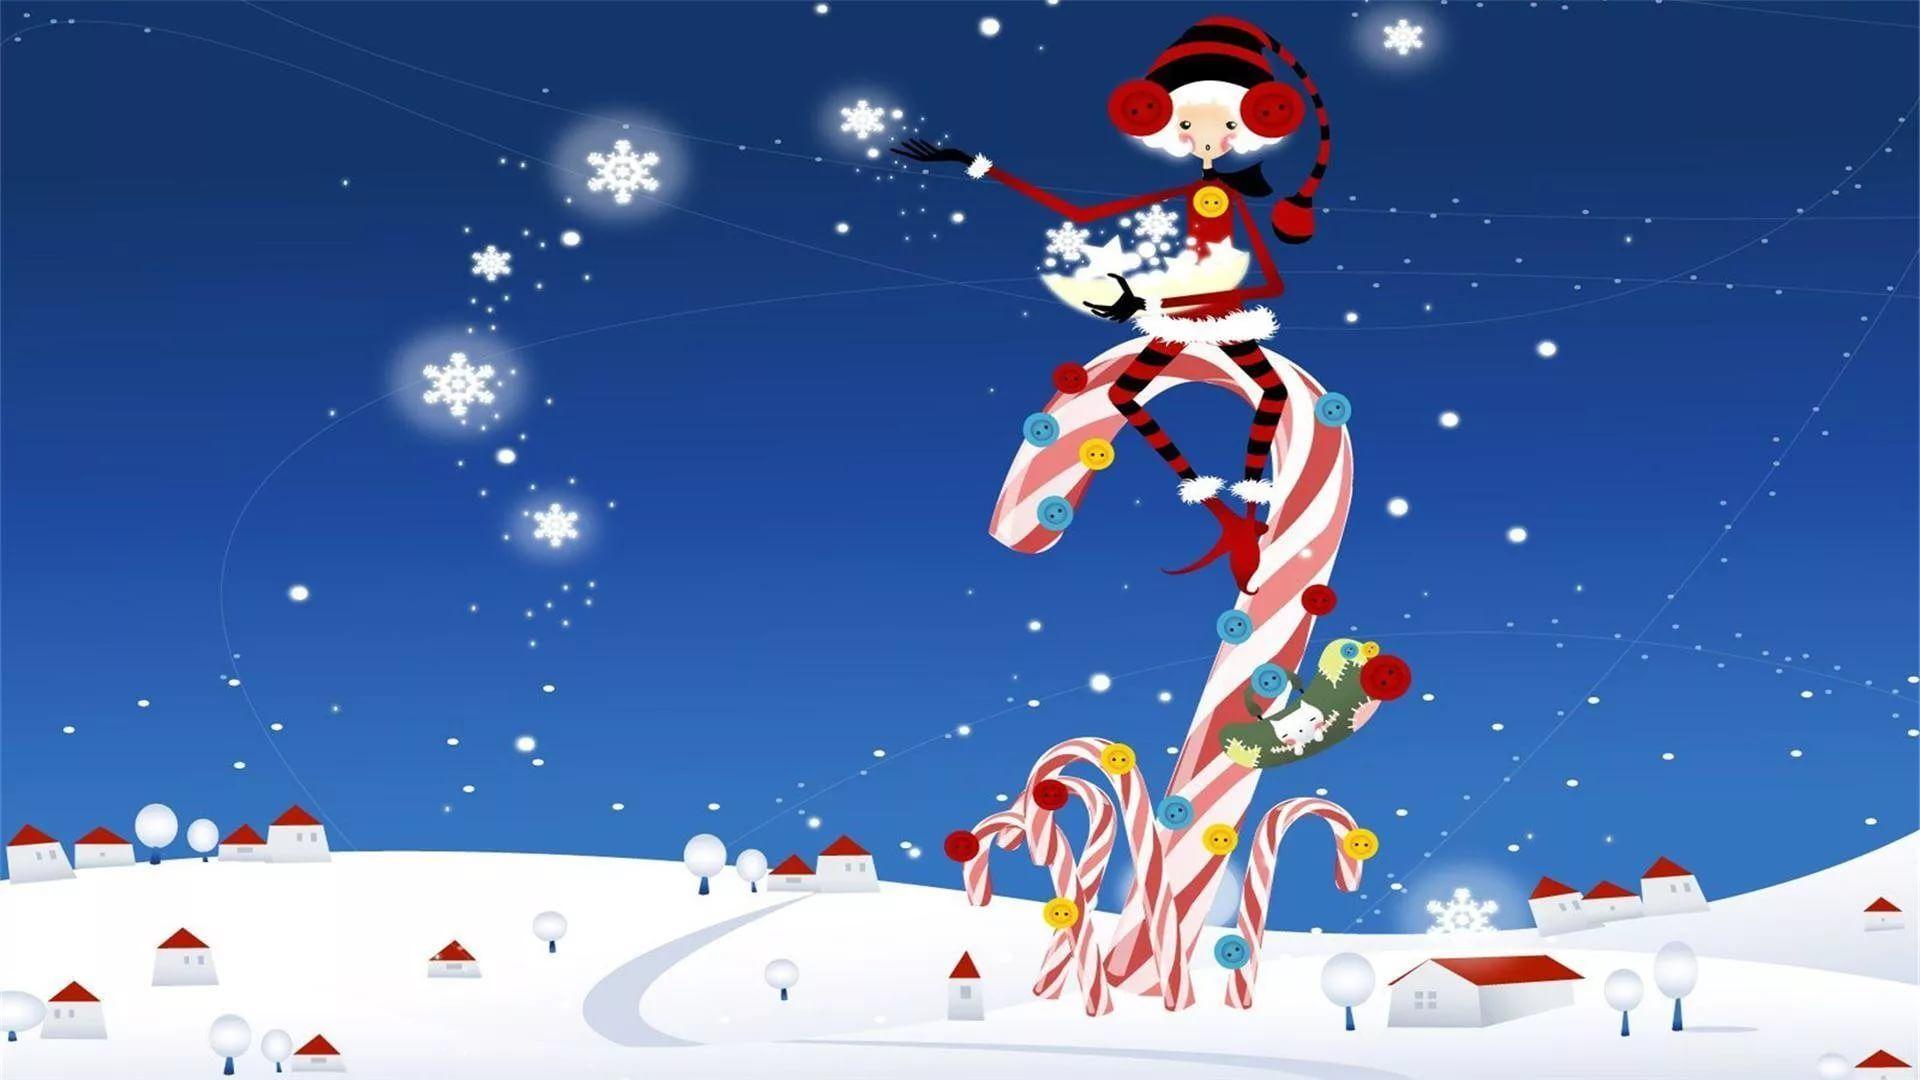 Funny Christmas HD 1080 wallpaper